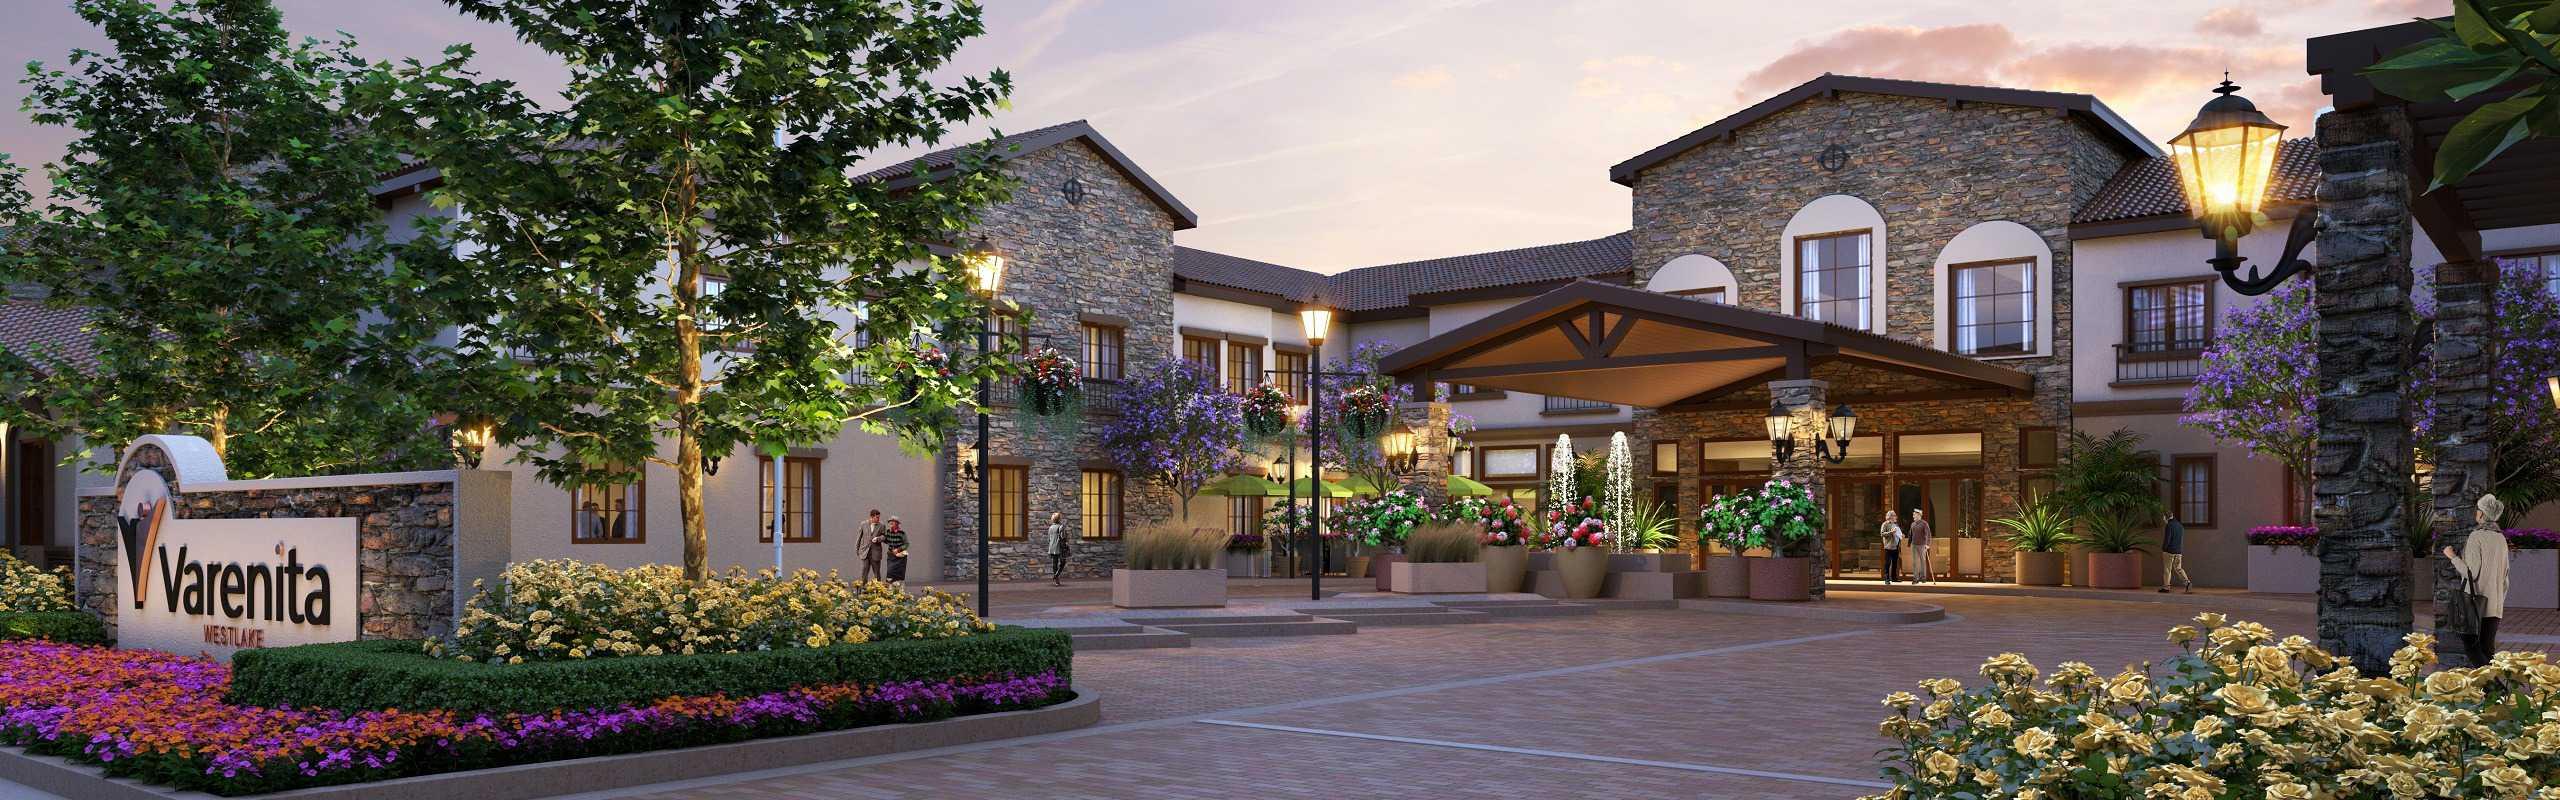 Varenita Luxury Retirement Communities Westlake CA